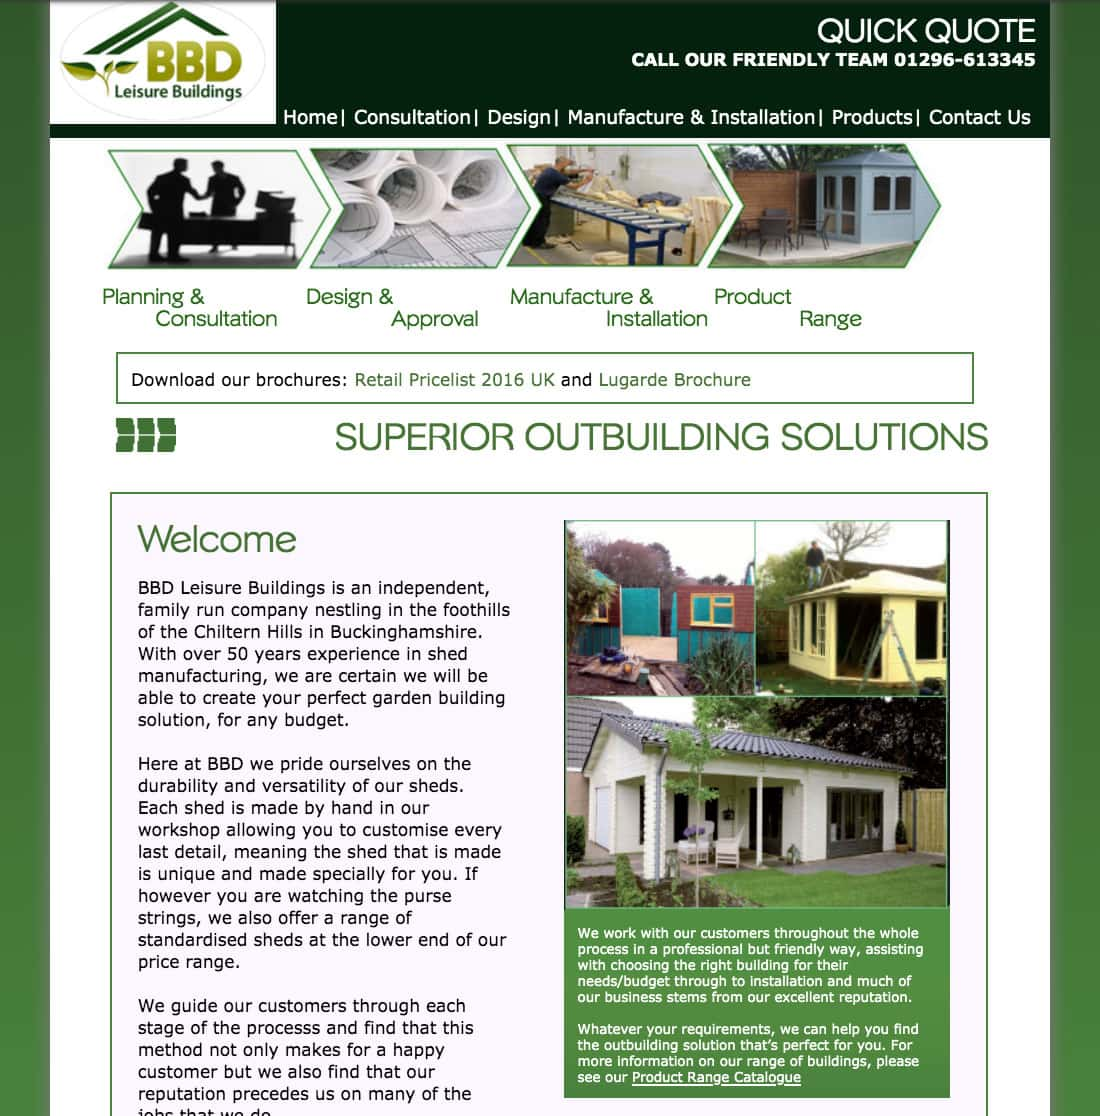 Old Design - BBD Leisure Buildings Homepage